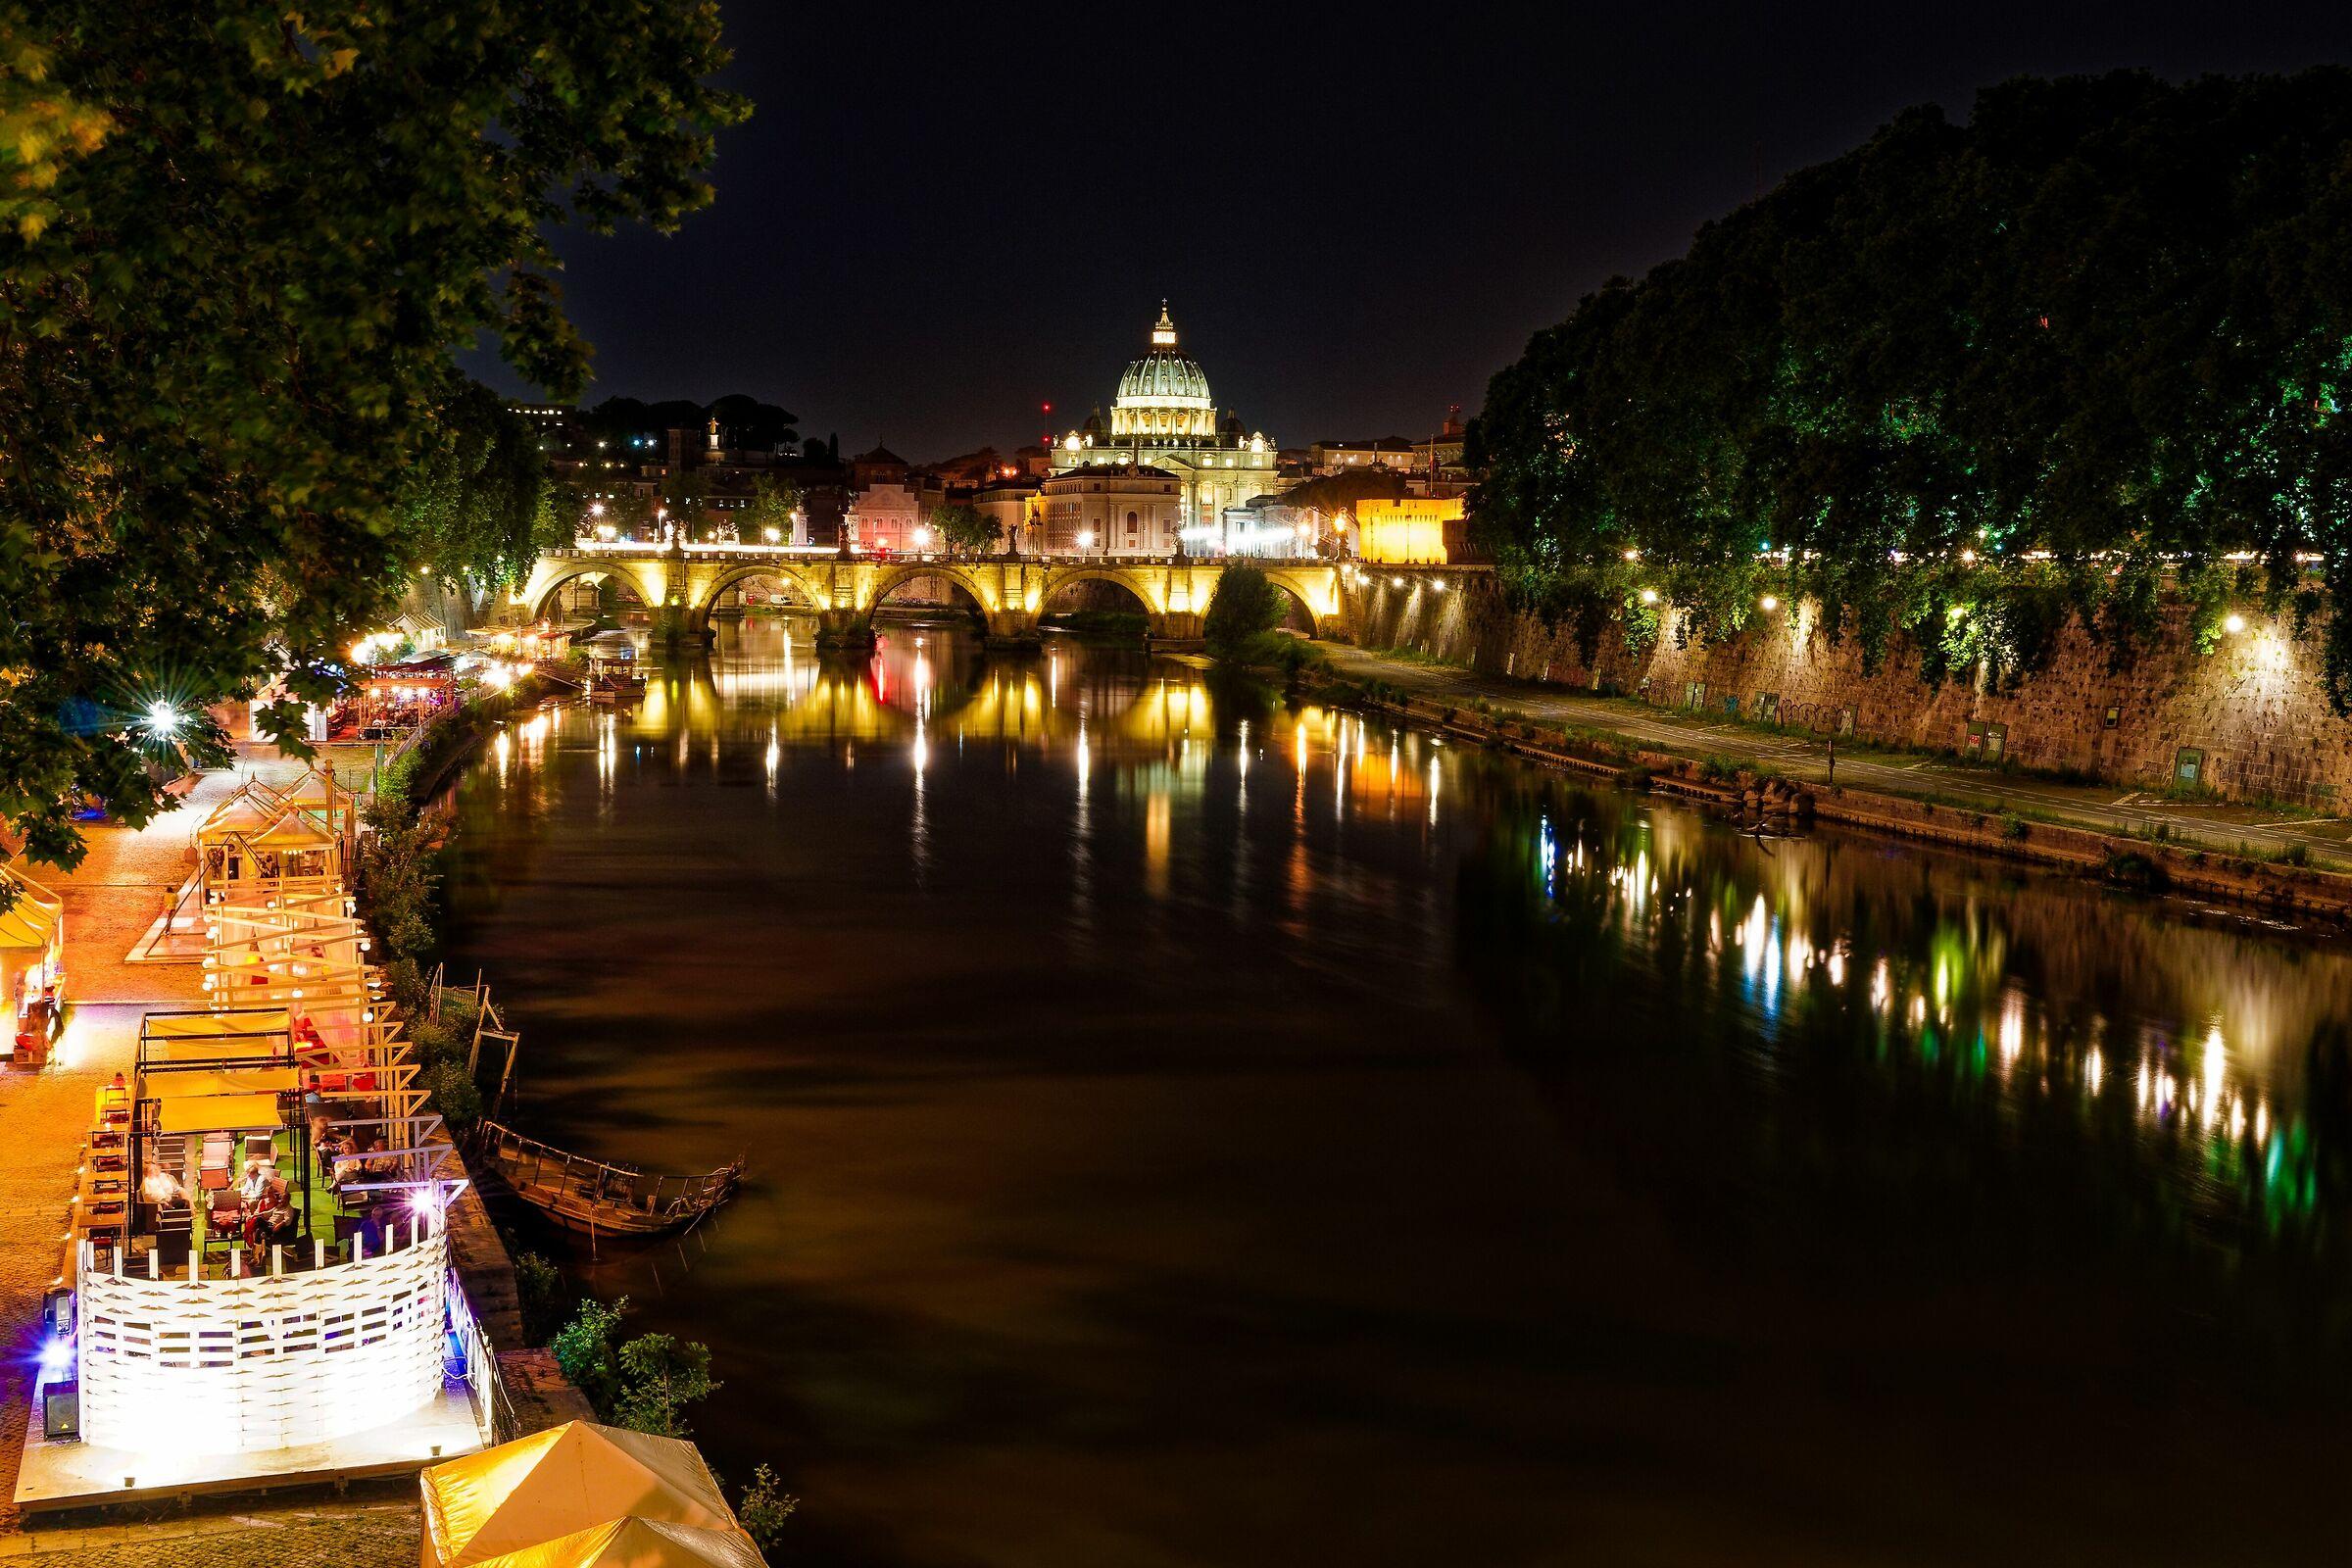 St. Peter's night...